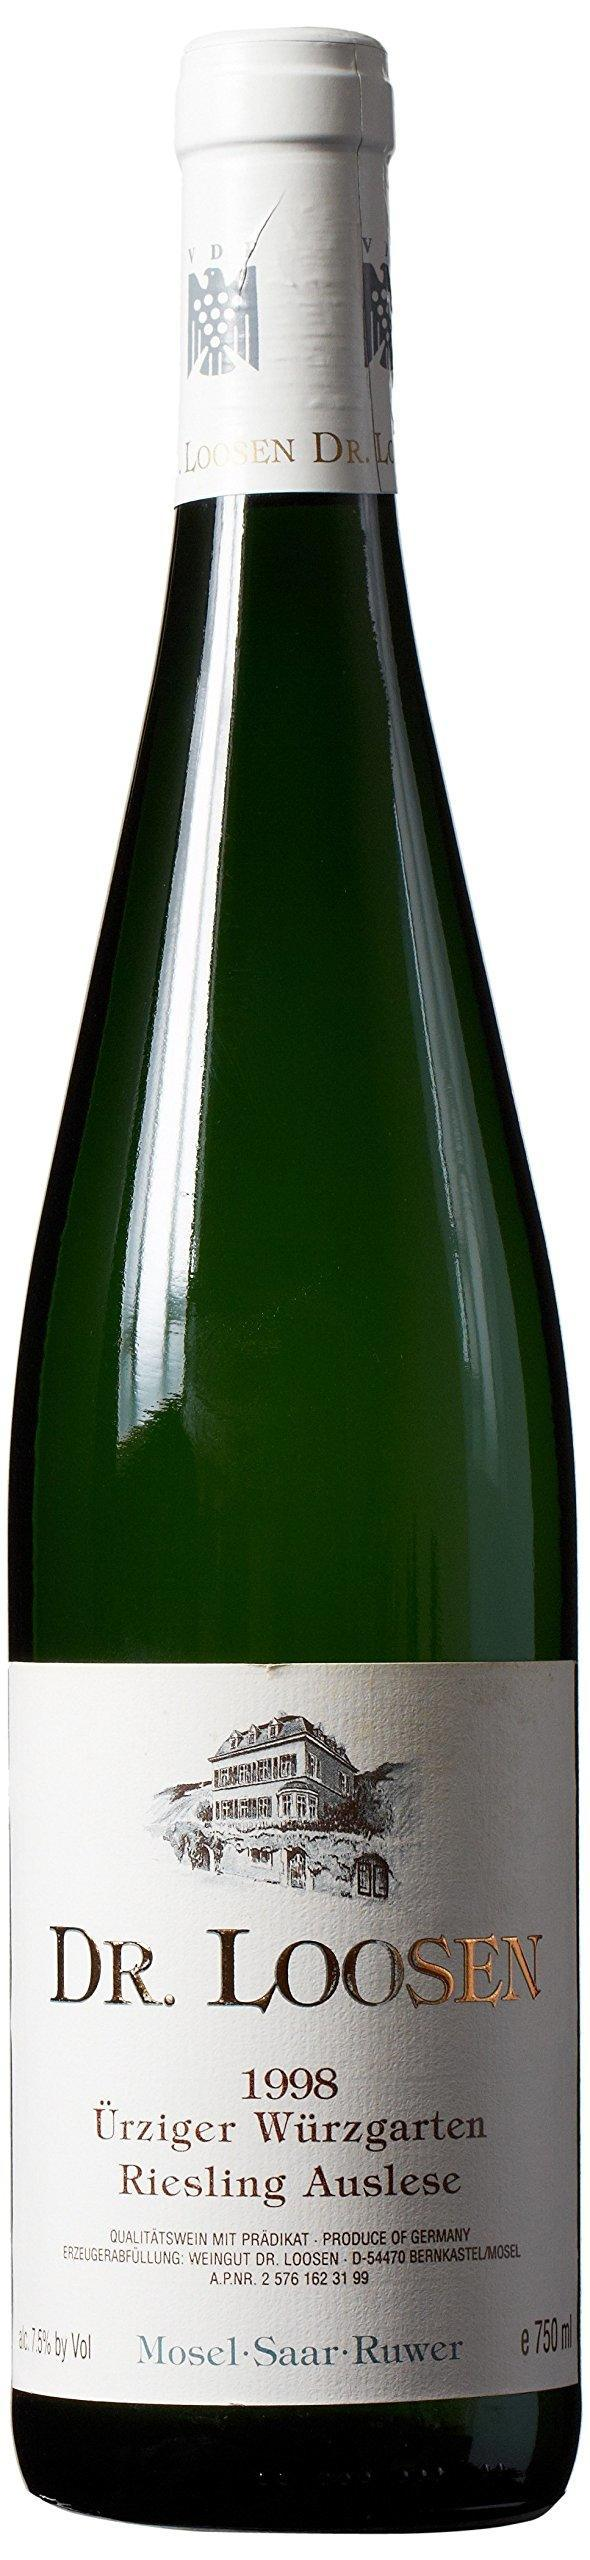 1998 Dr Loosen Urziger Wurzgarten Riesling Auslese Wine